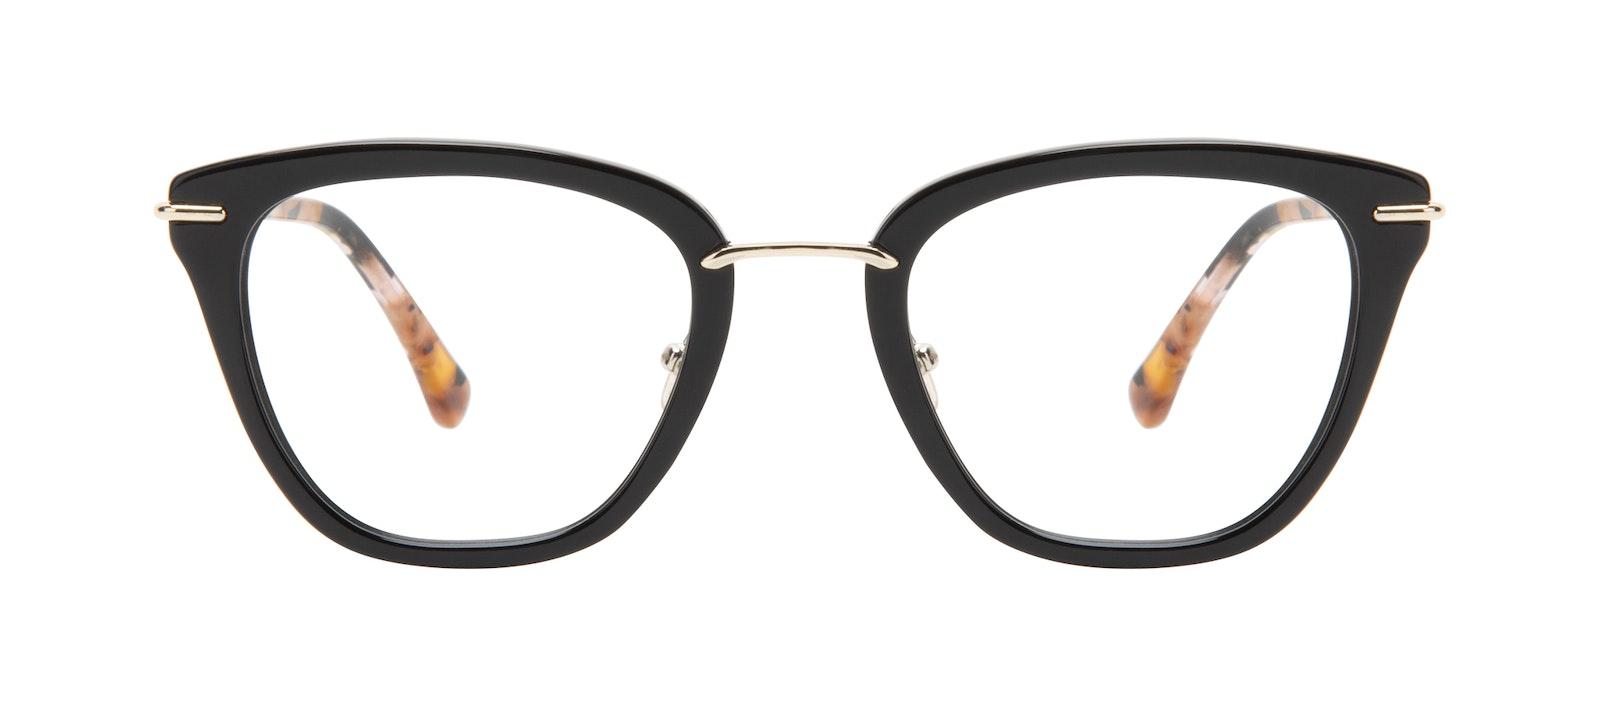 58d9343f5196 Affordable Fashion Glasses Square Eyeglasses Women Flirt Ebony Front